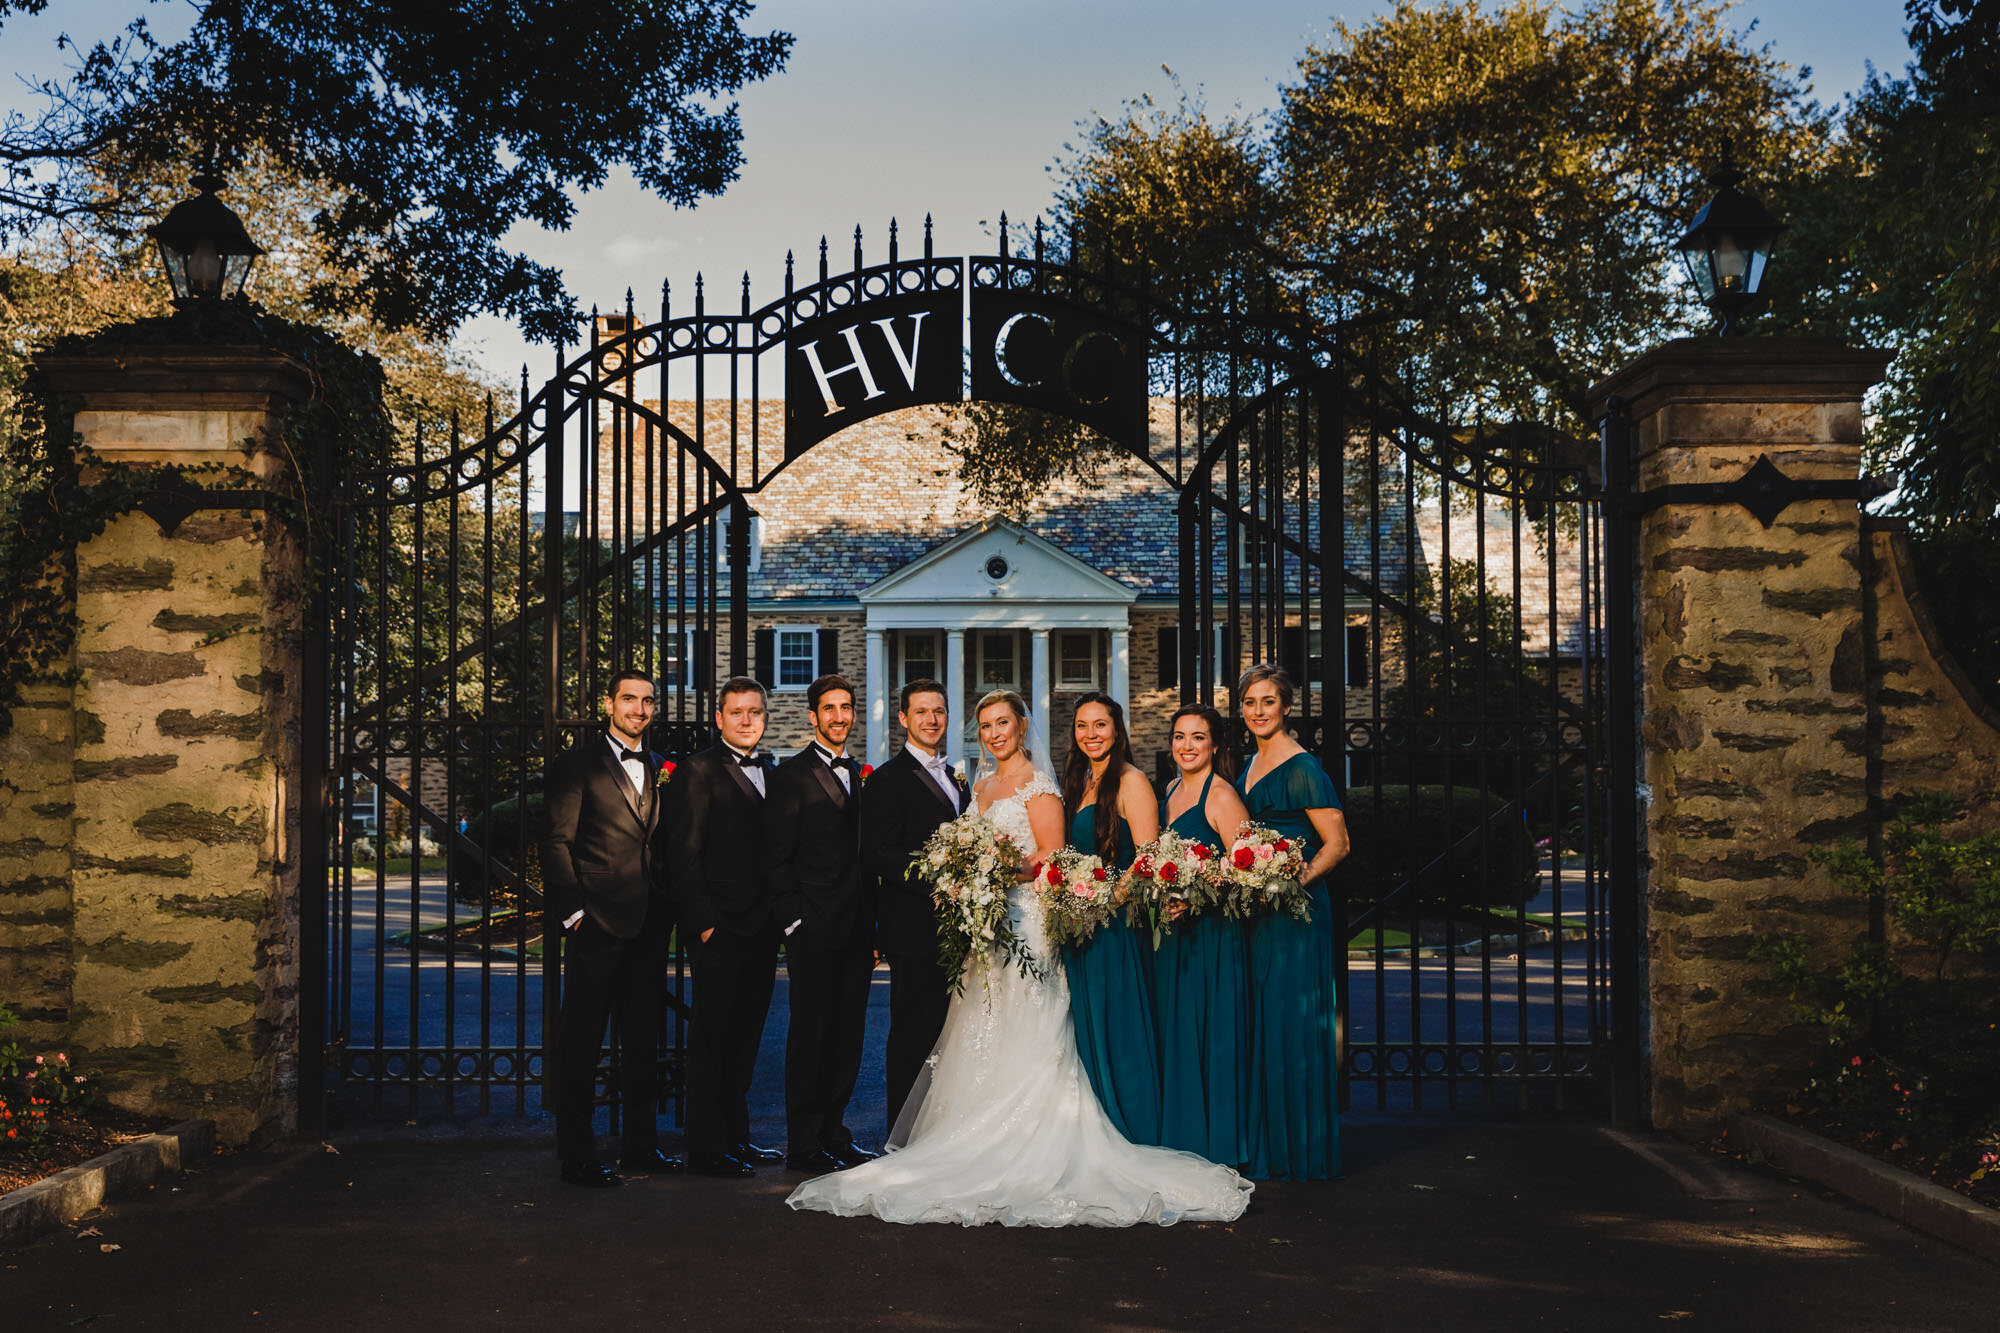 Christina & Dan Wedding at Huntingdon Valley Country Club 00014.JPG